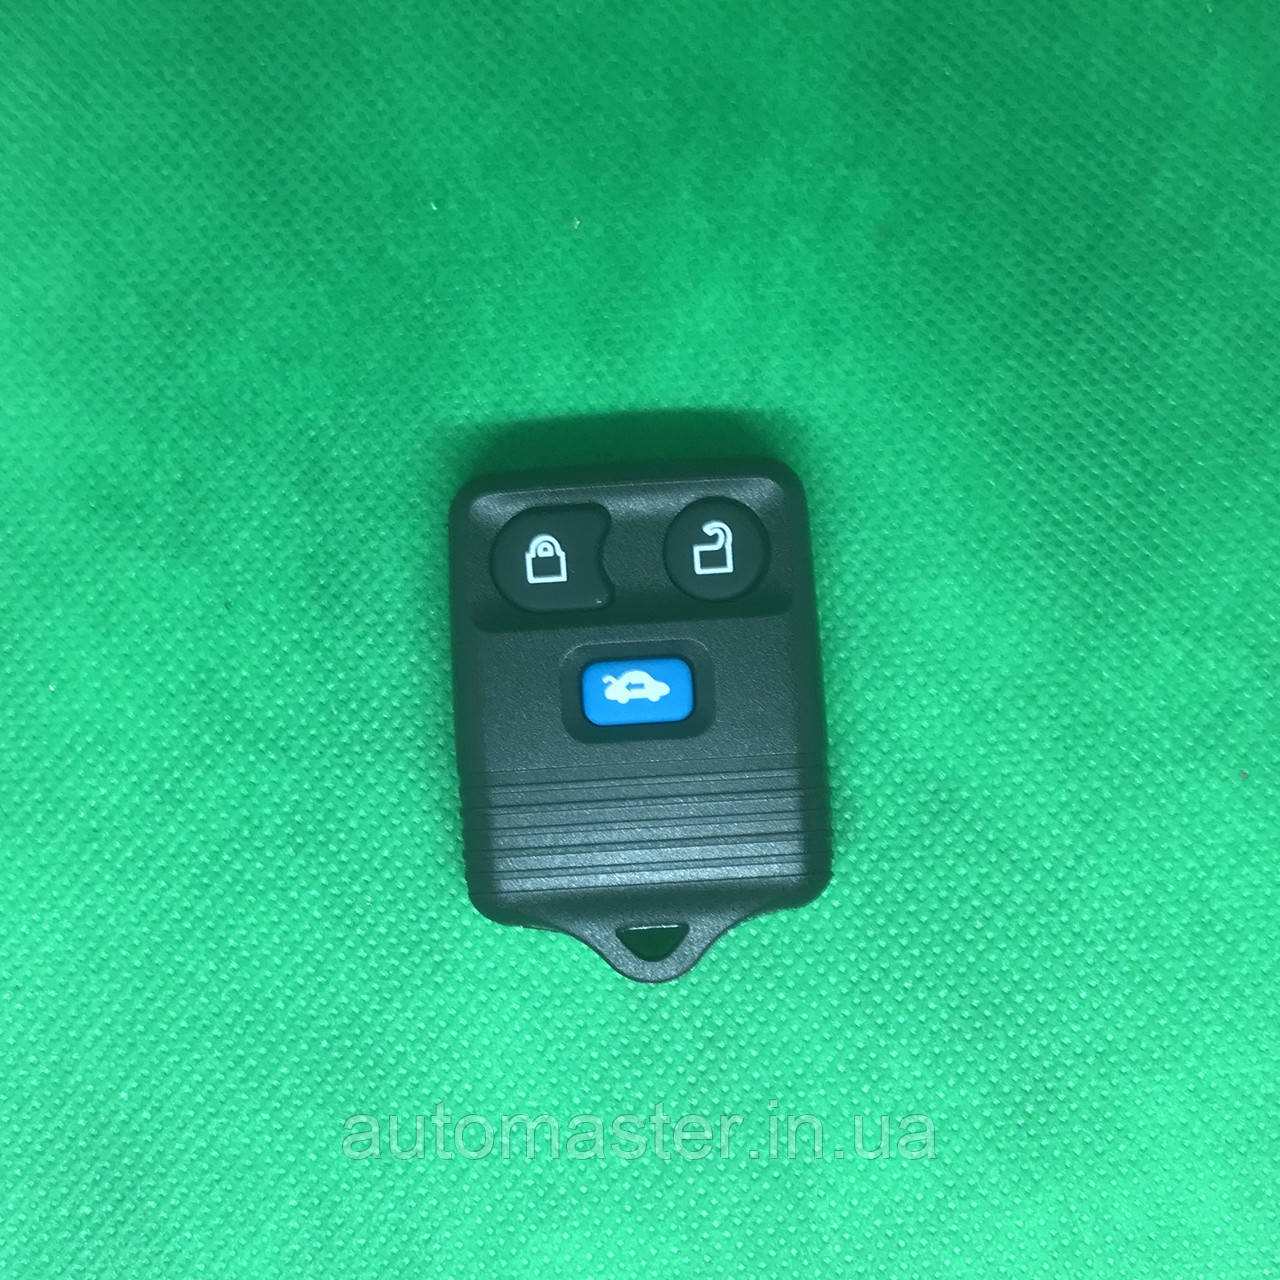 Брелок Форд Транзит  Ford Transit  3 кнопки 433 MHz